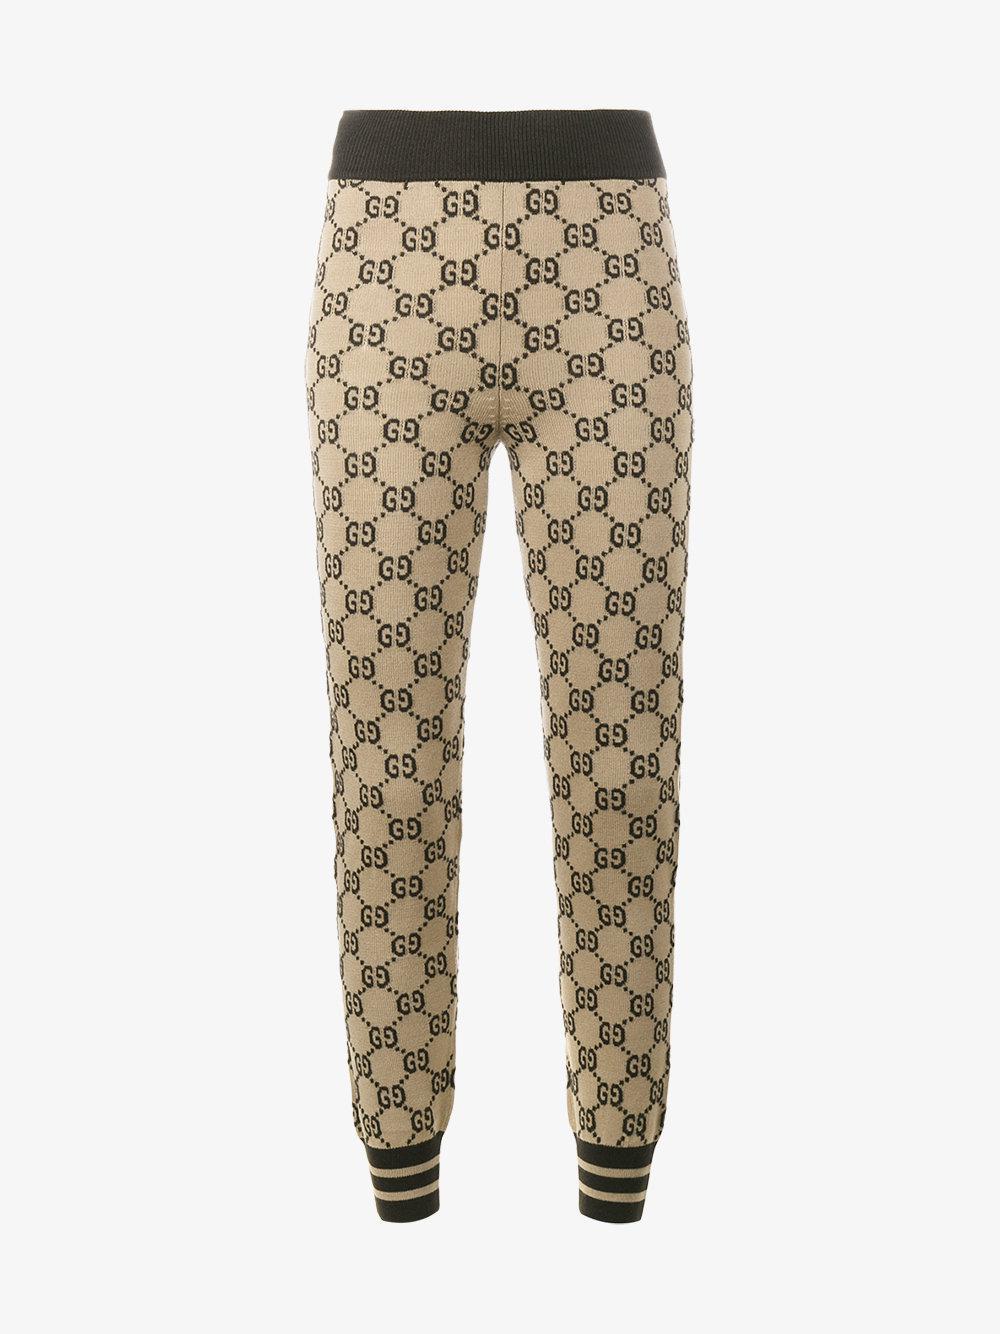 2dd694ba09eed Gucci Logo Intarsia Knitted Leggings in Brown - Lyst